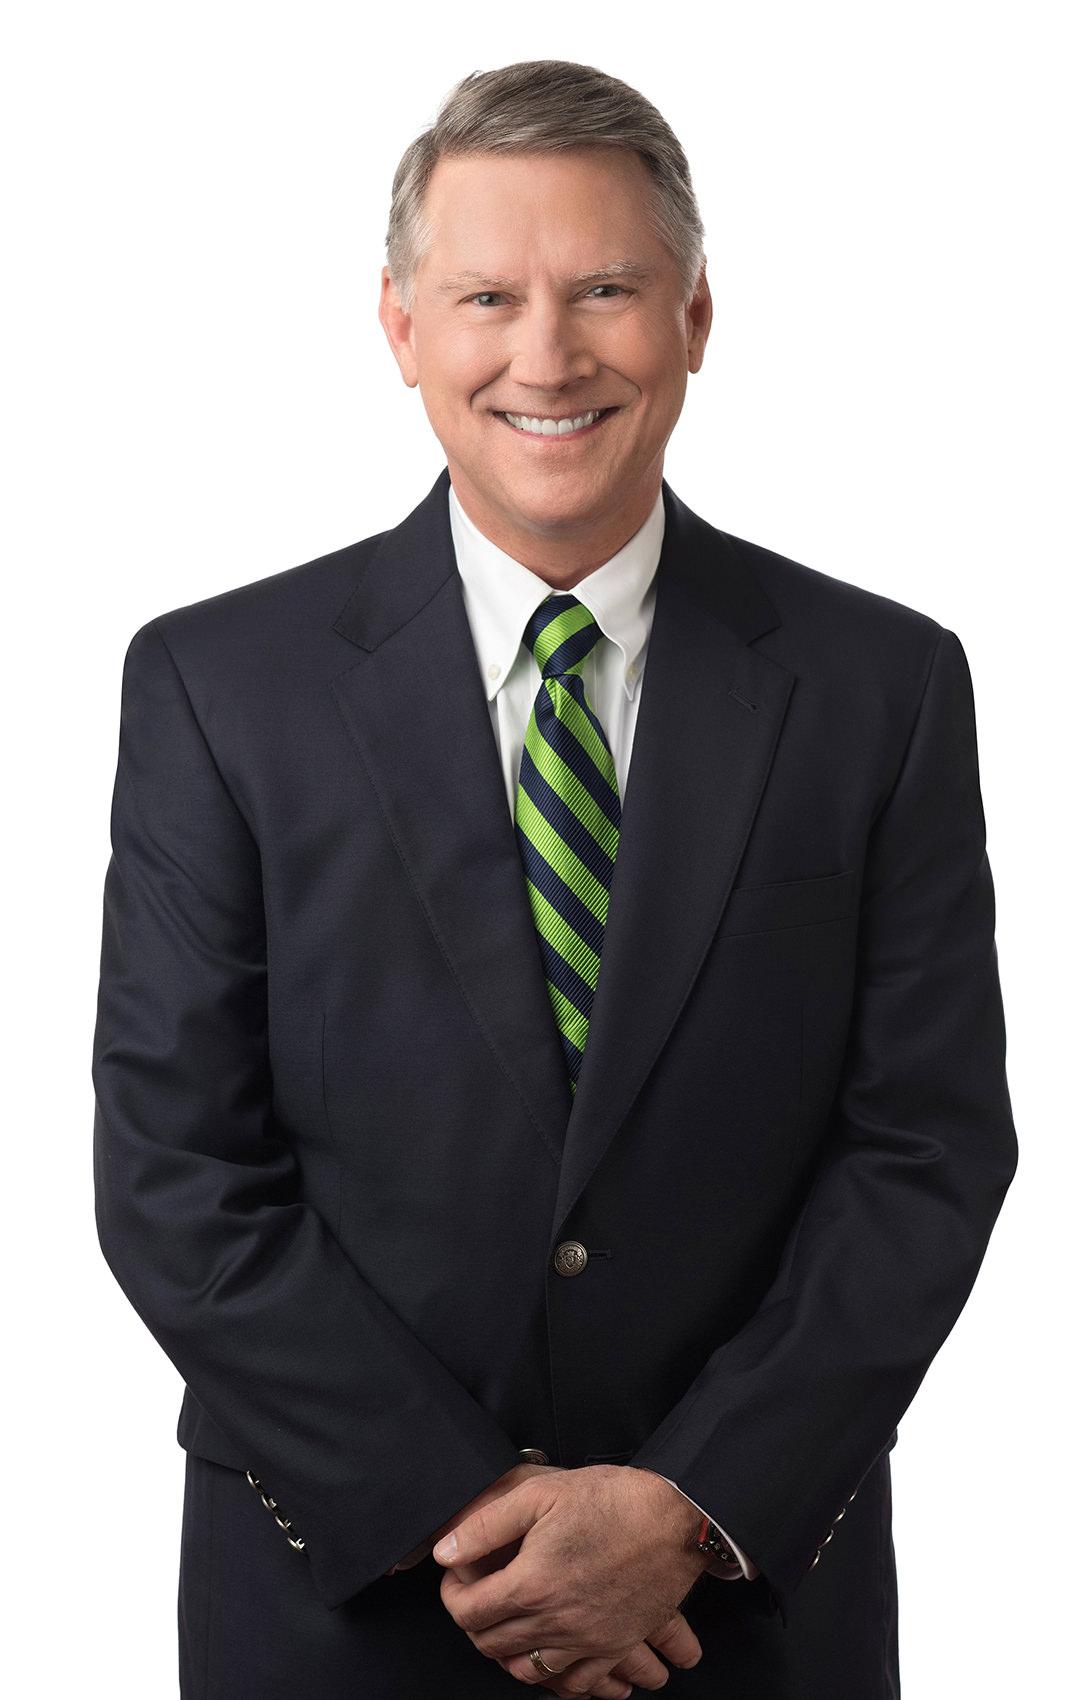 Dennis A. Wicker